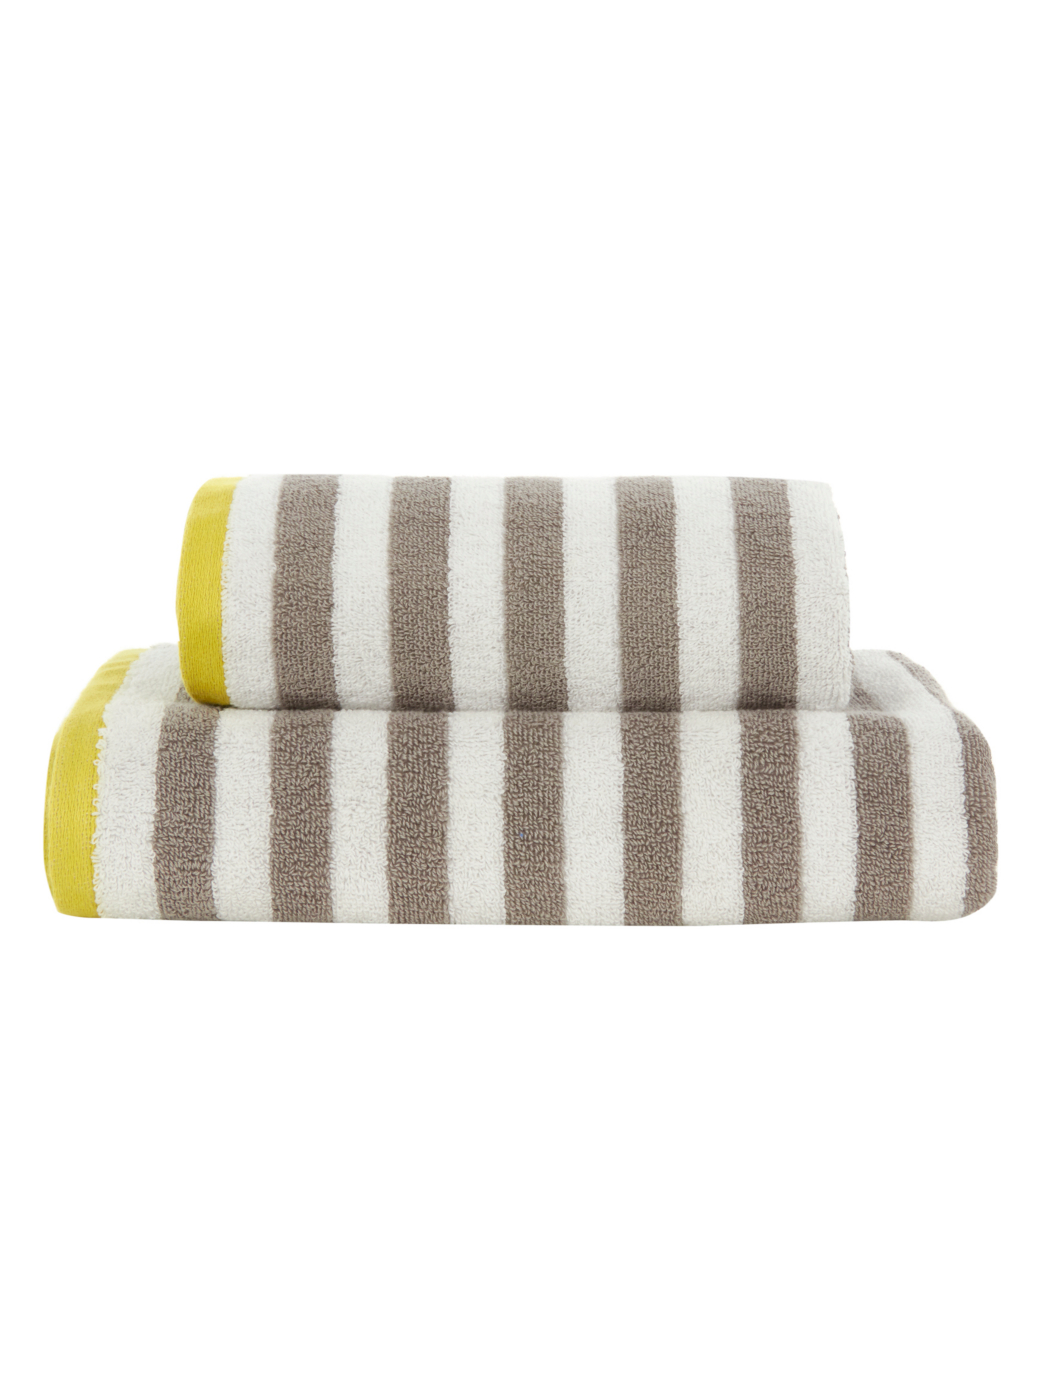 George Home Grey and Yellow Stripe Towel Range